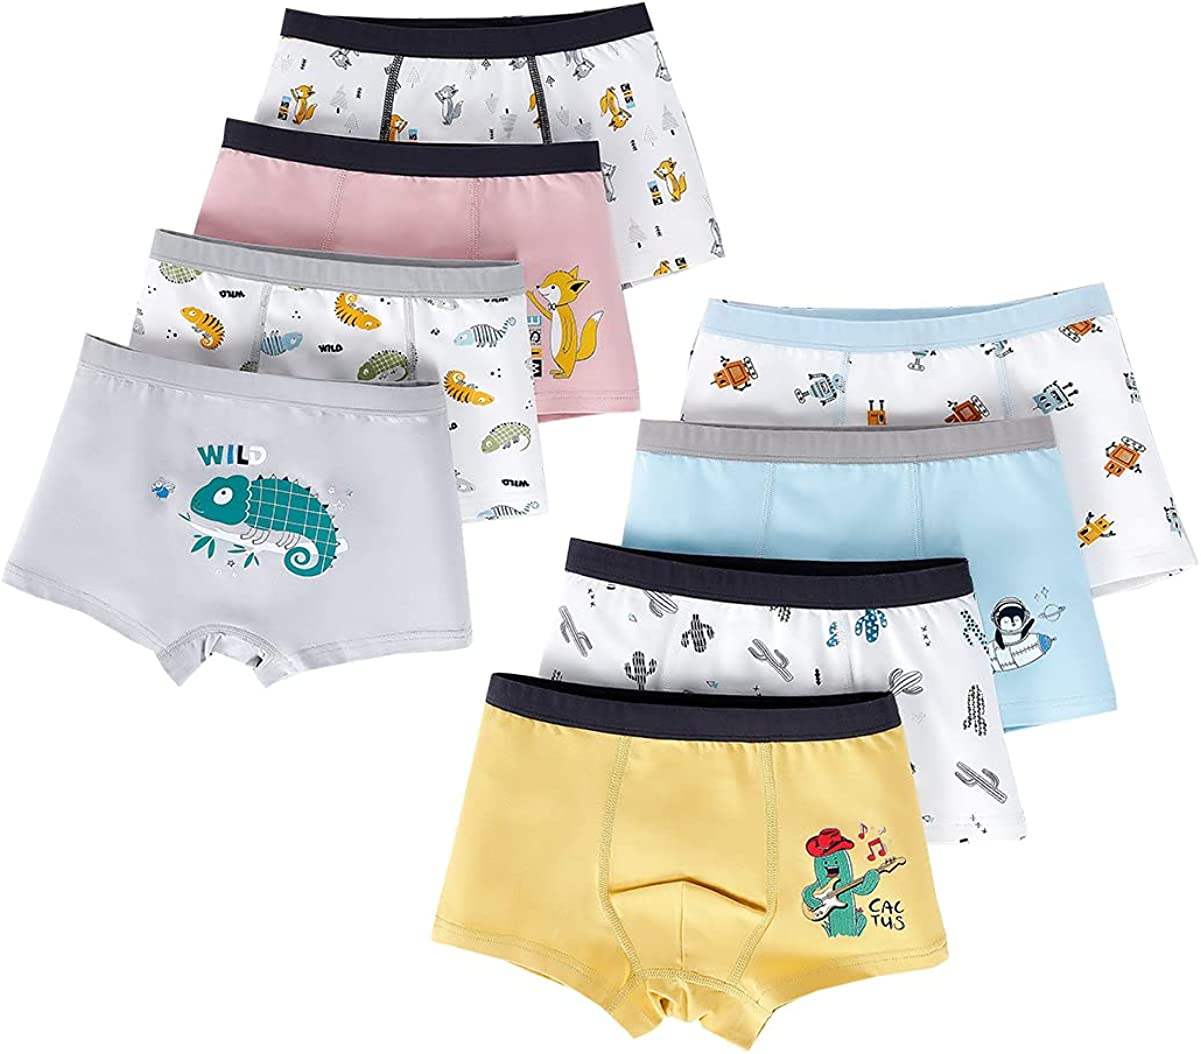 Lashapear Little Boys Cotton Assorted Shorts Boxer Briefs Underwear 8 Pack 2-12 Years